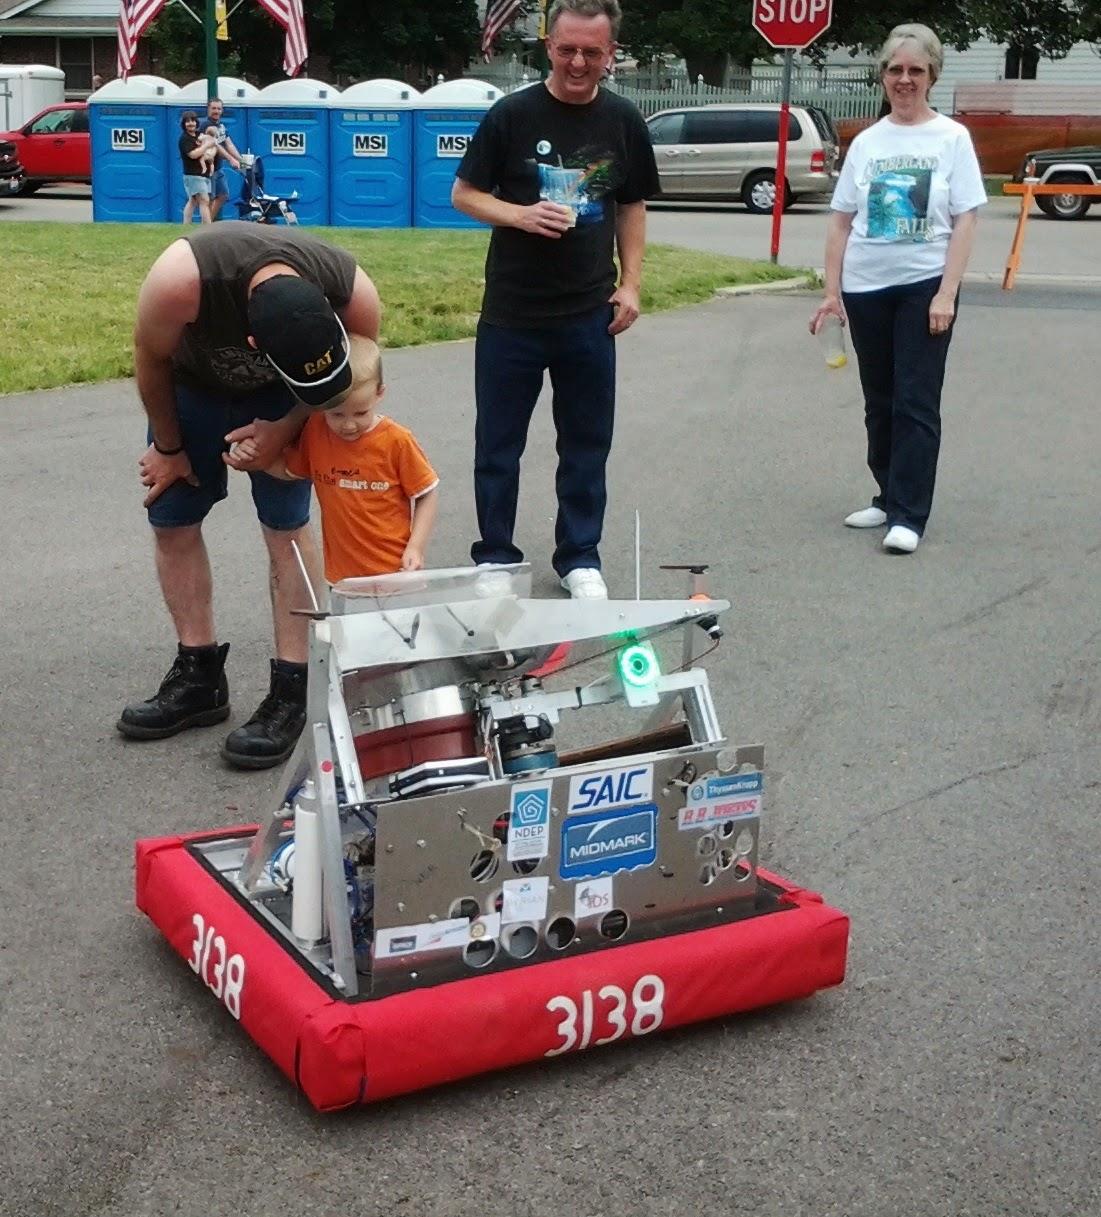 Stem School Miami: DarkeJournal.com: Innovators Robotics To Appear At Poultry